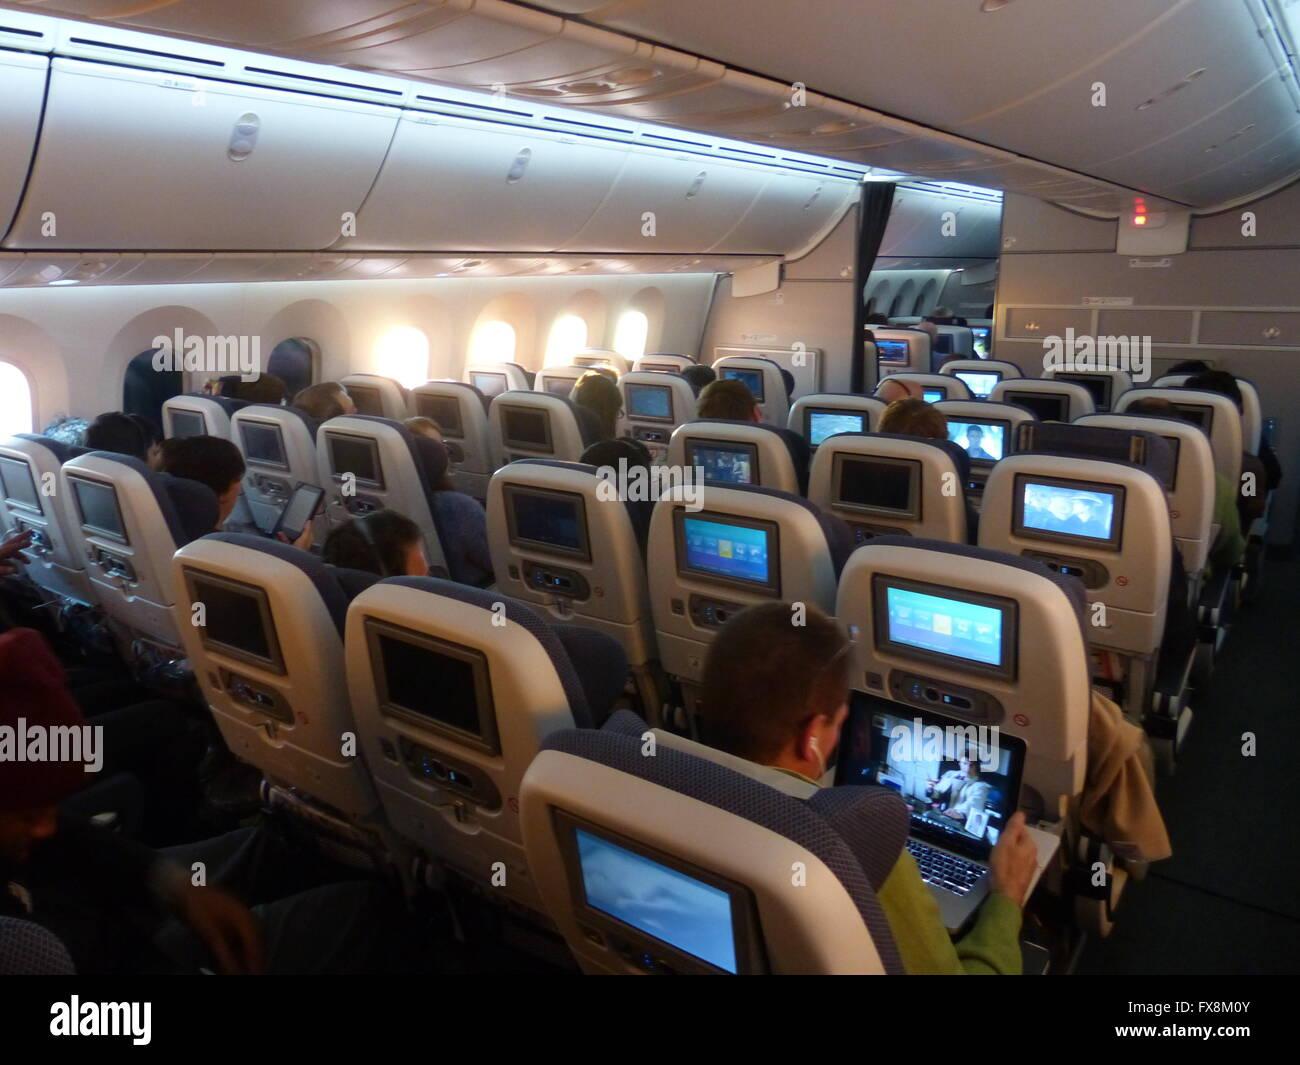 Airbus a380 interior stockfotos airbus a380 interior for Airbus a380 interior